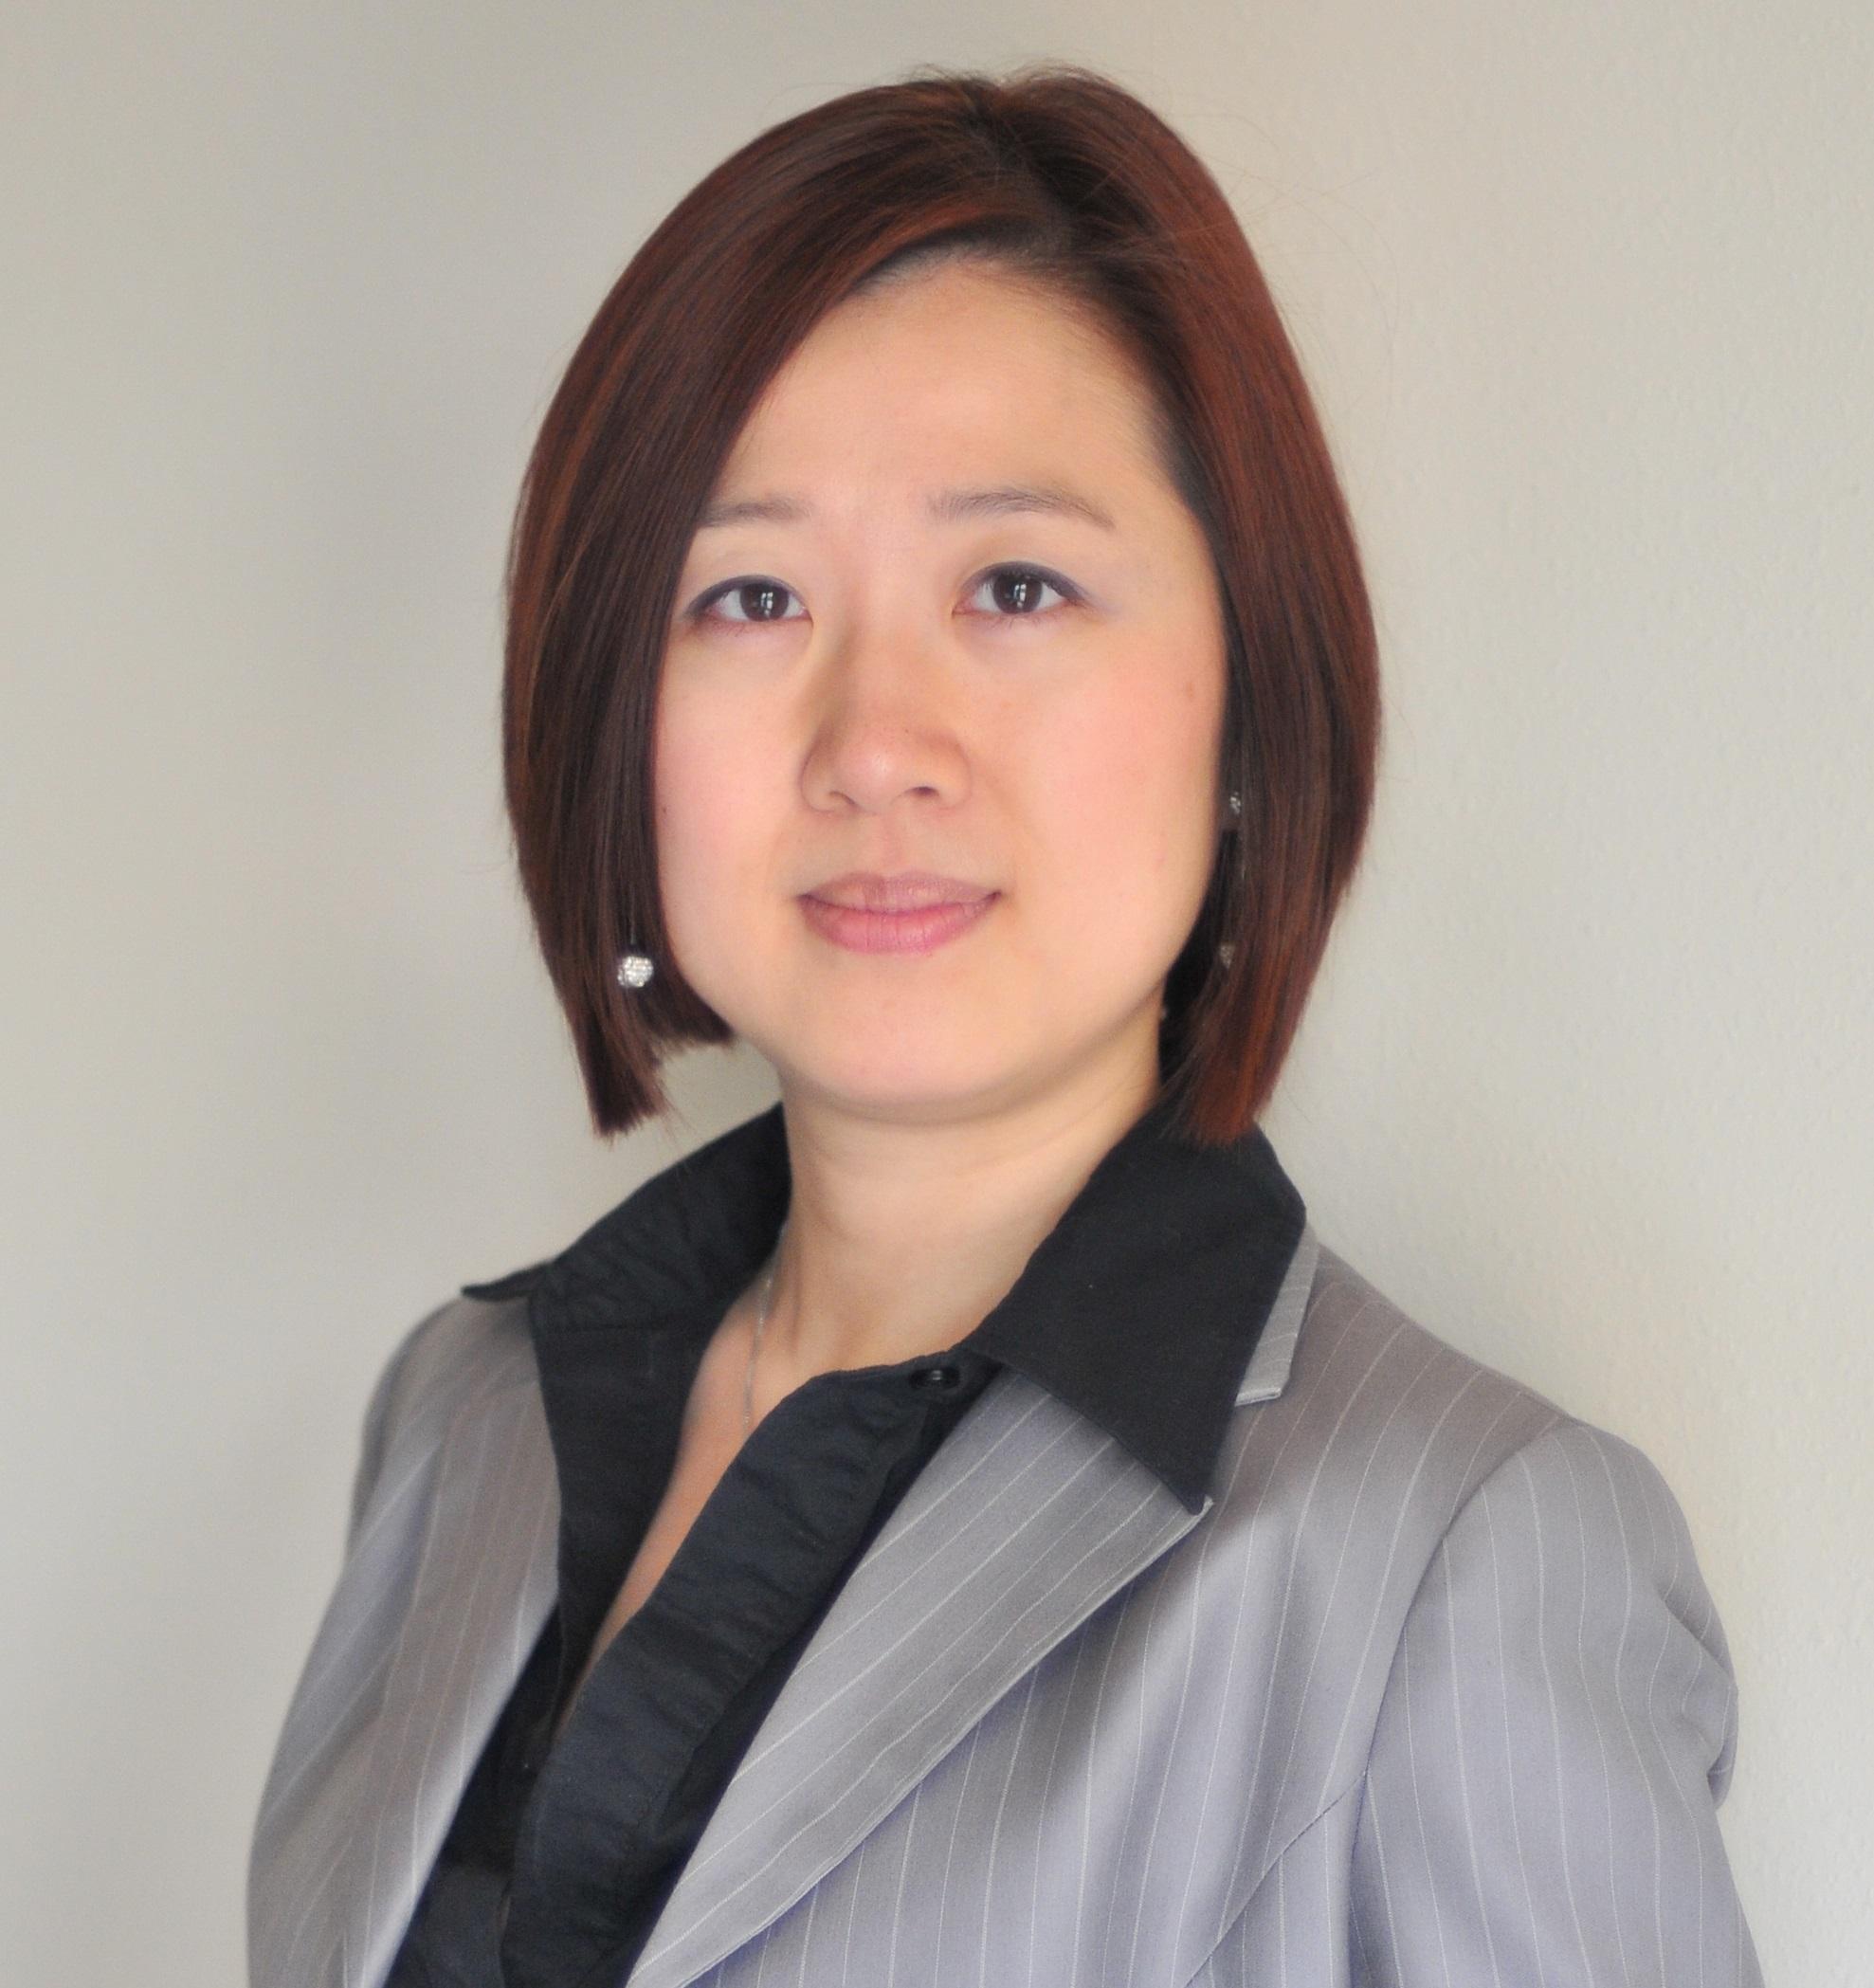 Huan Xie